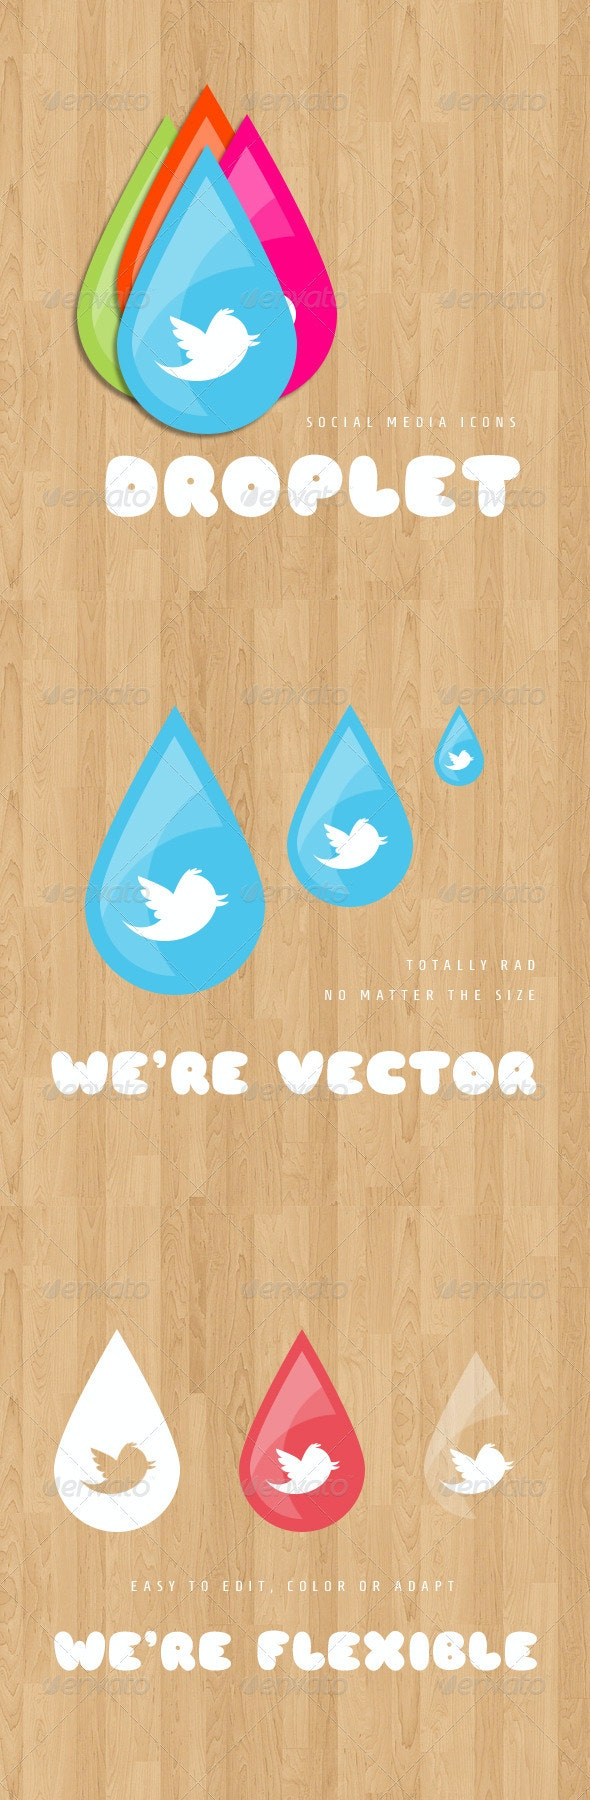 Droplet Social Media Icons - Web Icons